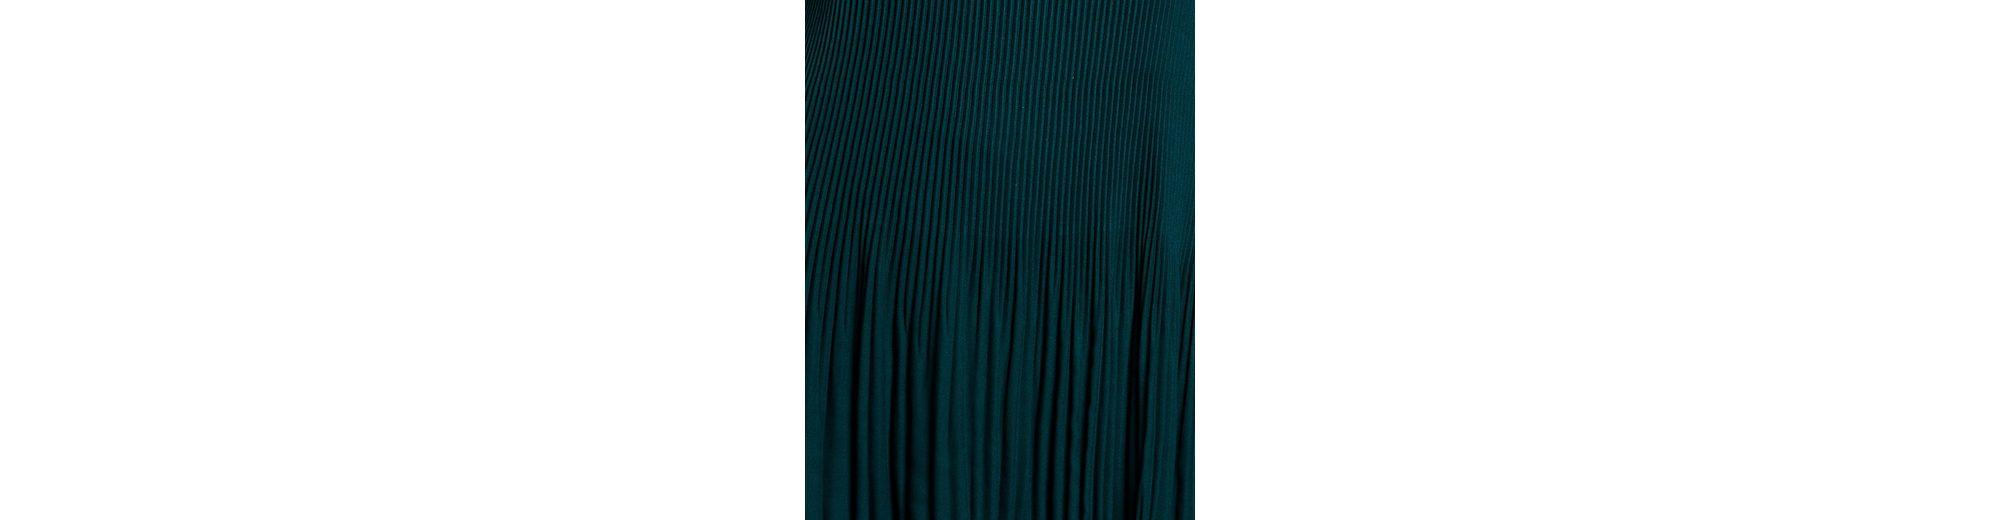 ASHLEY BROOKE by Heine Tunika Plissee-Falten Outlet Erschwinglich Komfortabel Günstig Online bWhBX6